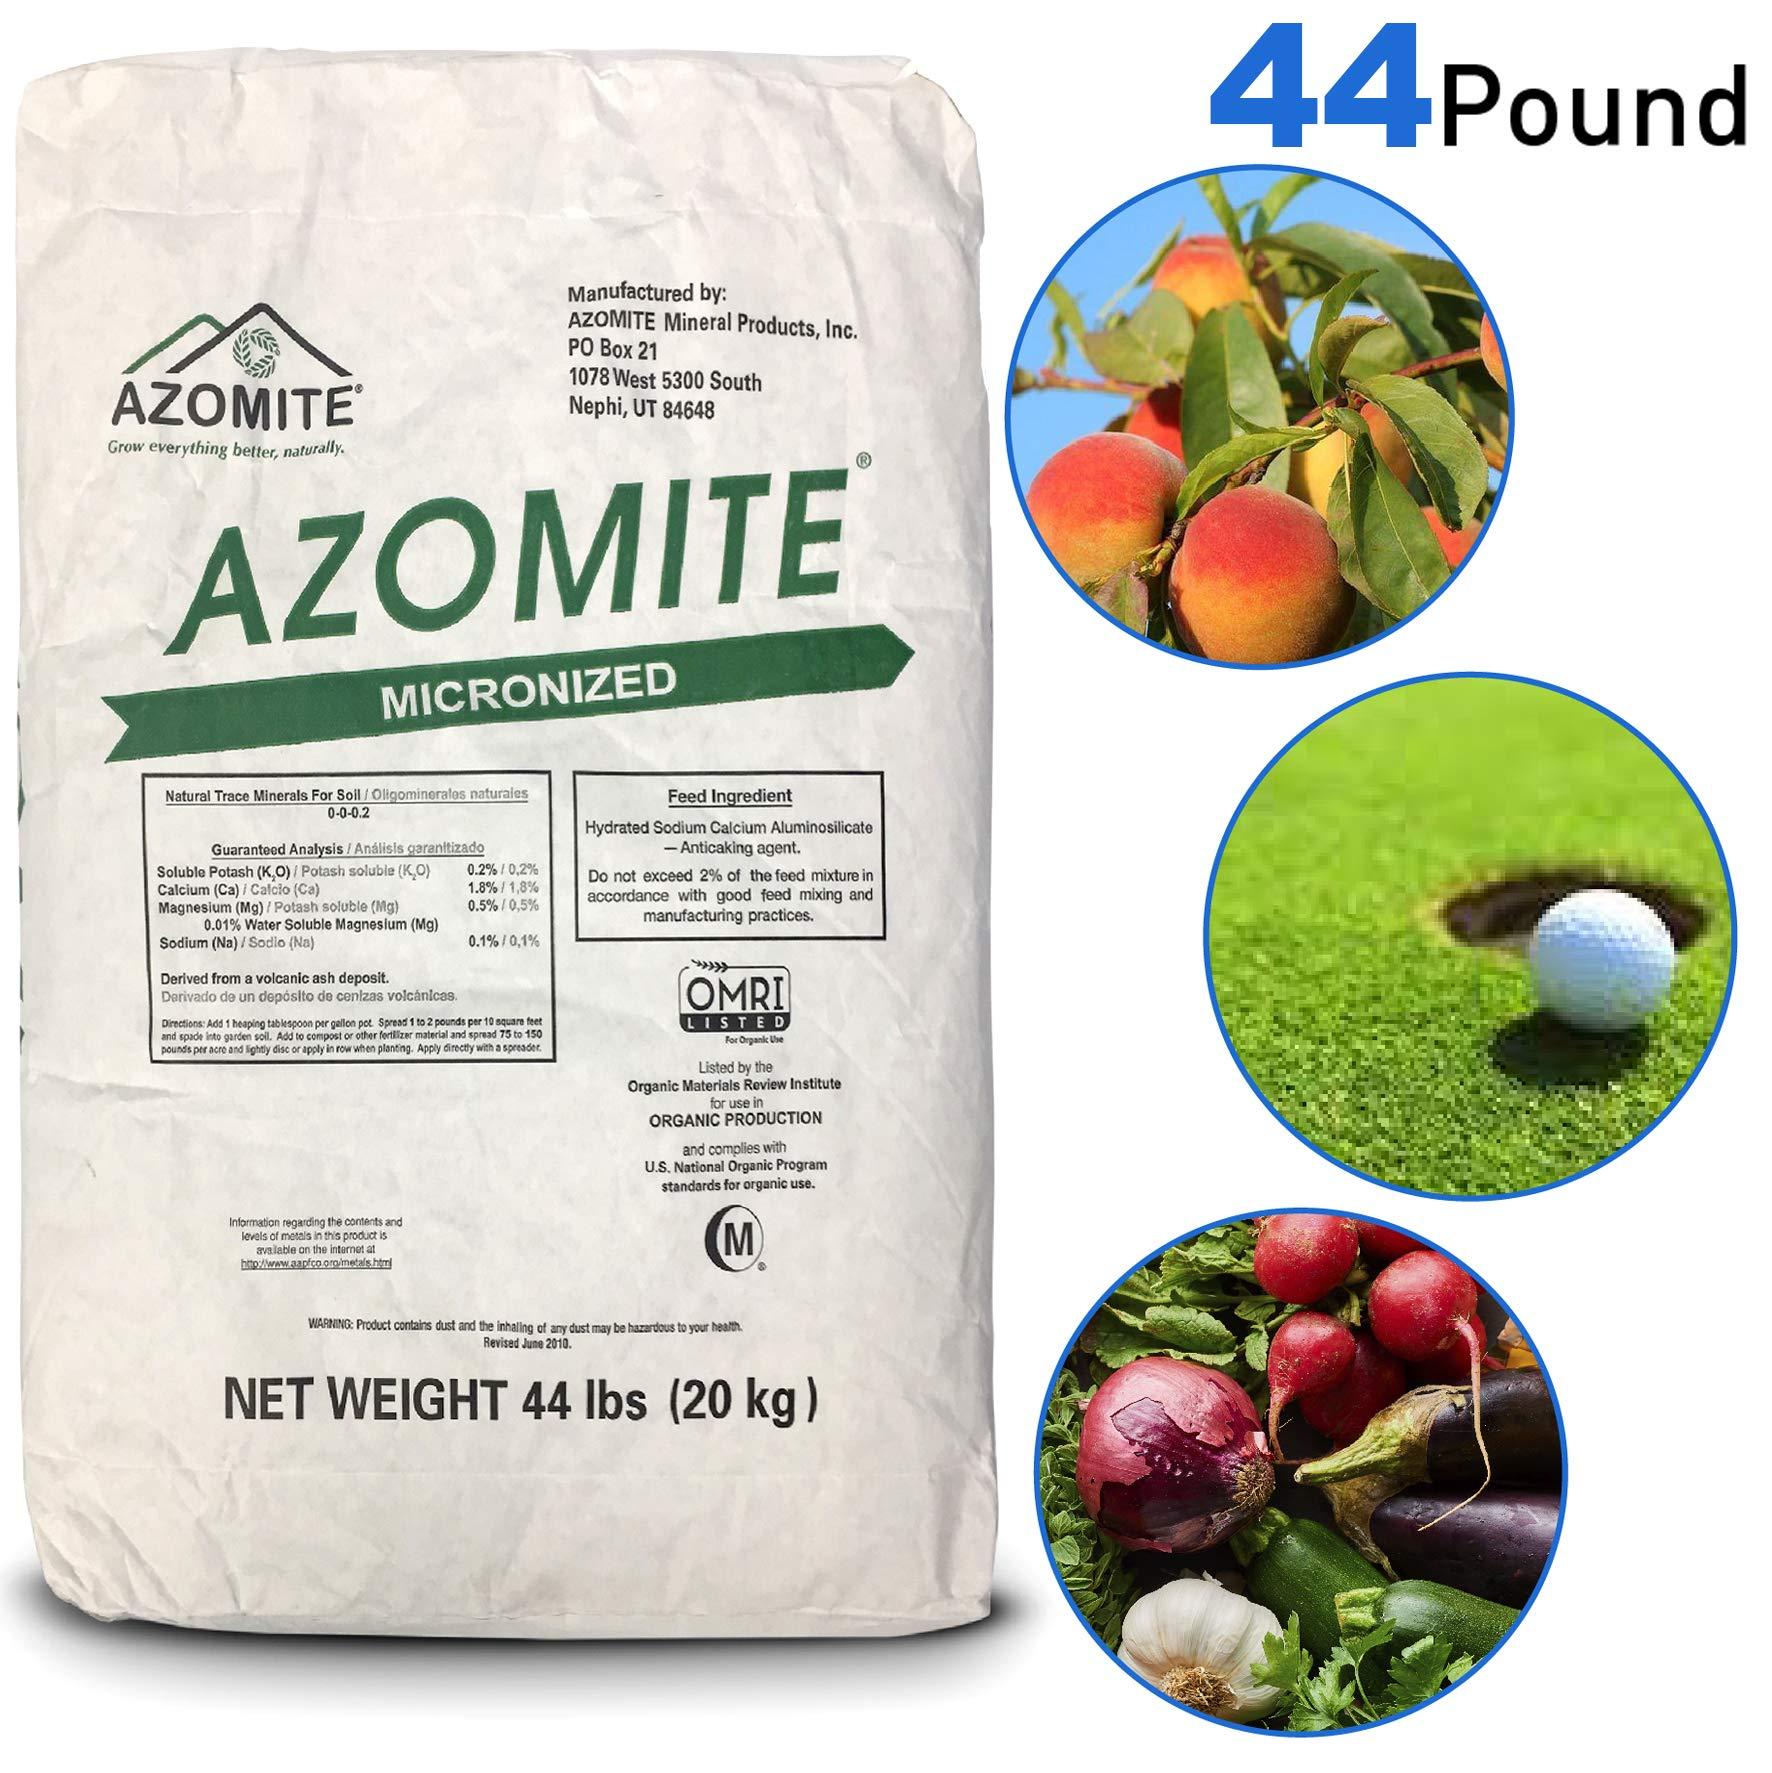 Azomite AZOMITE-44-1 Azomite-44A Bag Micronized Bag-100% Natural 44 lb, White by Azomite